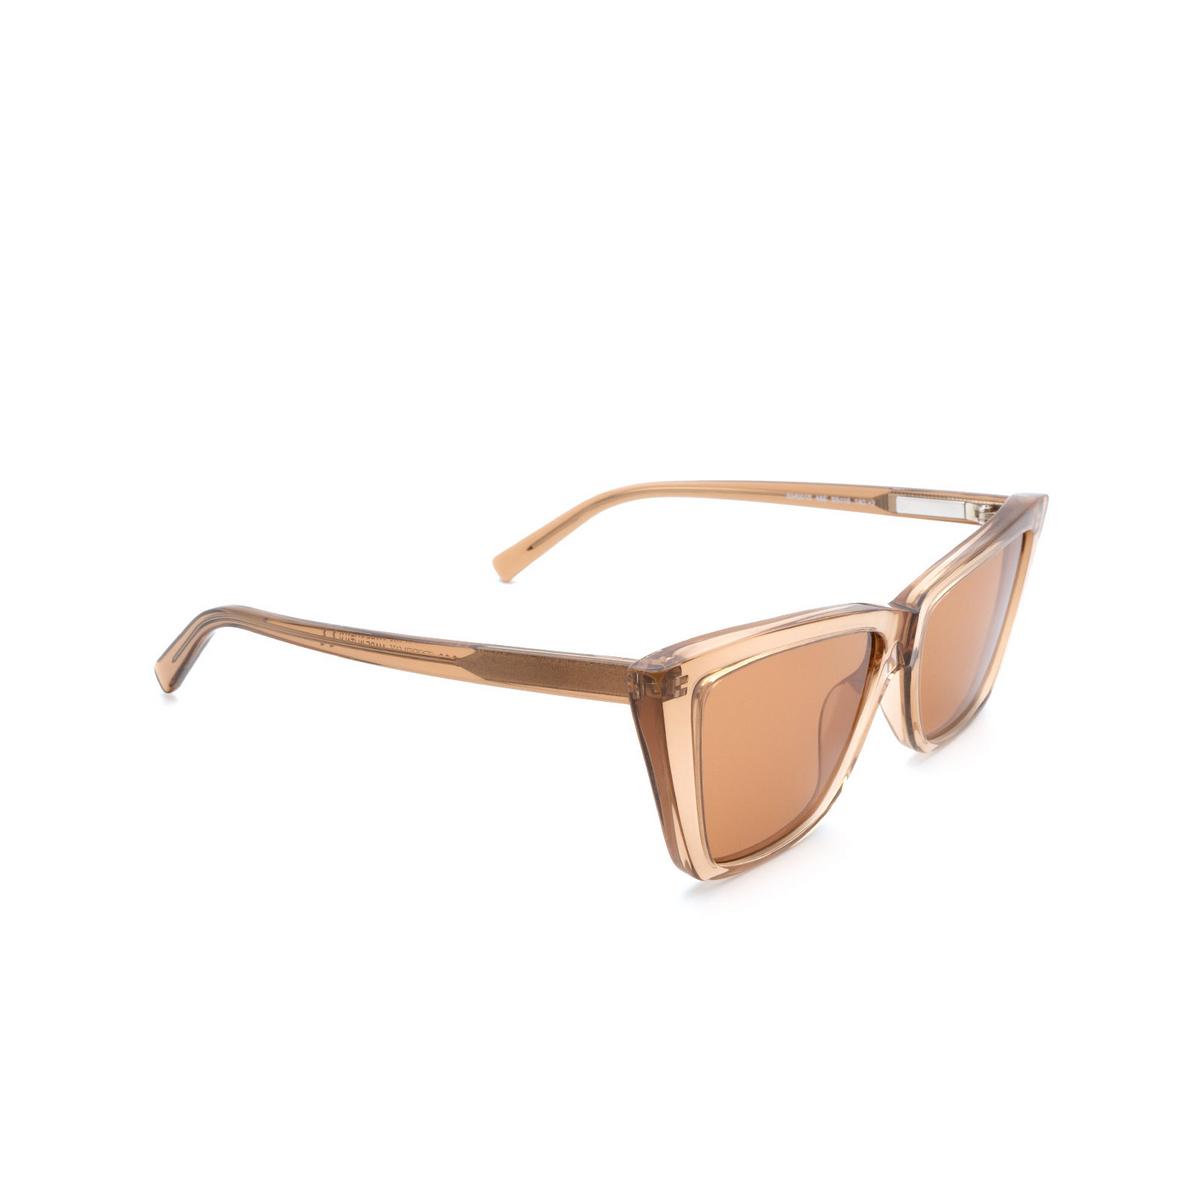 Sportmax® Butterfly Sunglasses: SM0015 color Dark Brown 48E - three-quarters view.